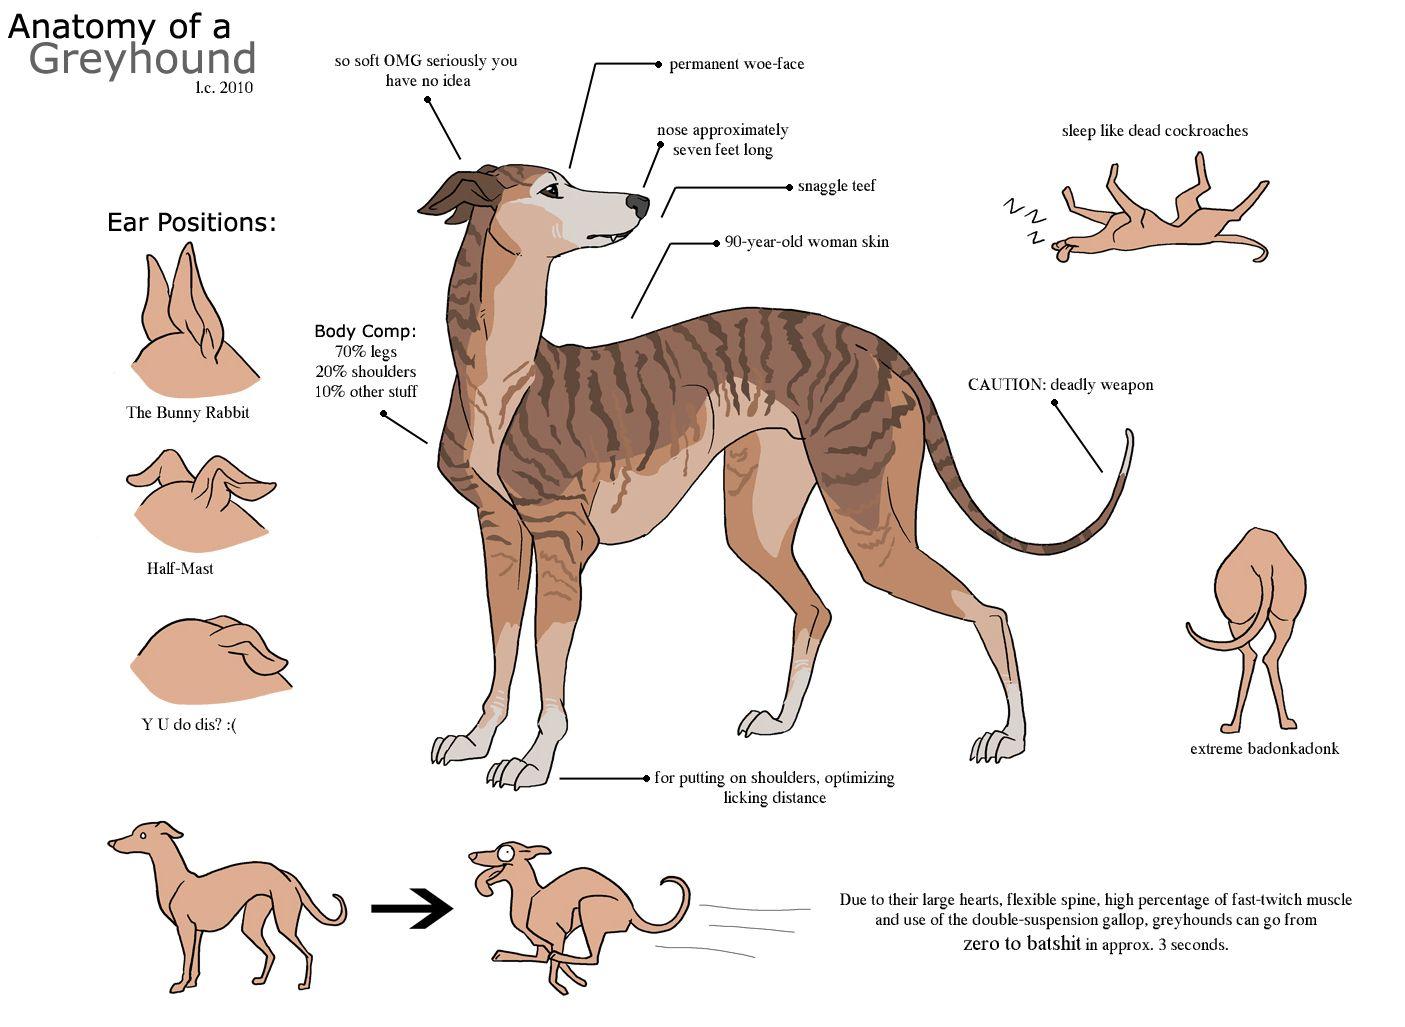 Anatomy of a (silly) Greyhound | Animal Anything | Pinterest ...